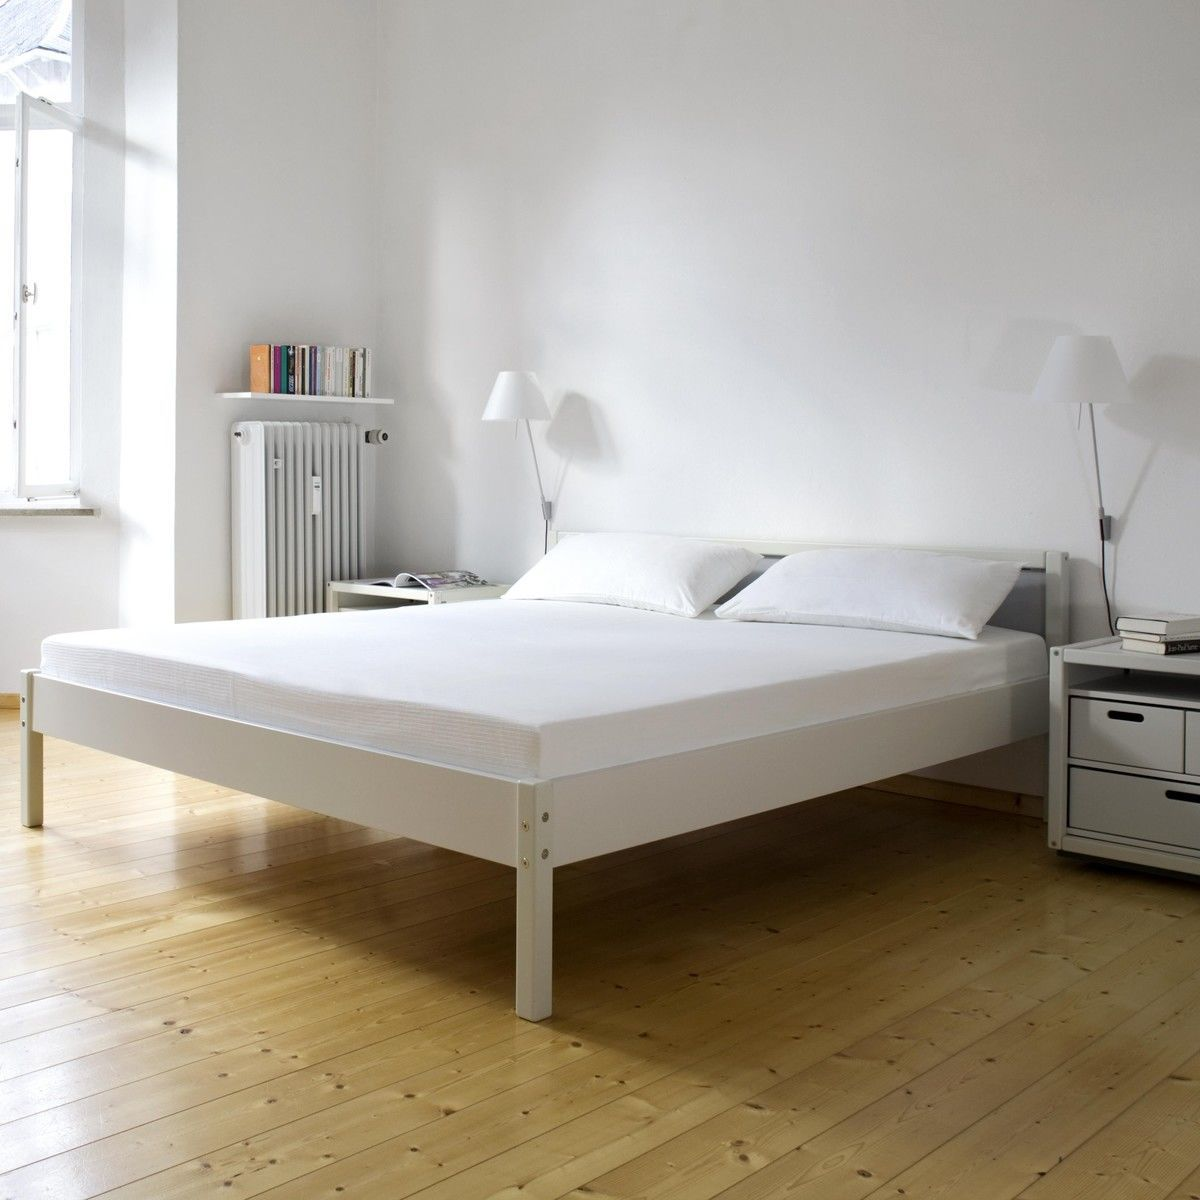 Flötotto Profilsystem profilsystem bed with headrest flötotto ambientedirect com